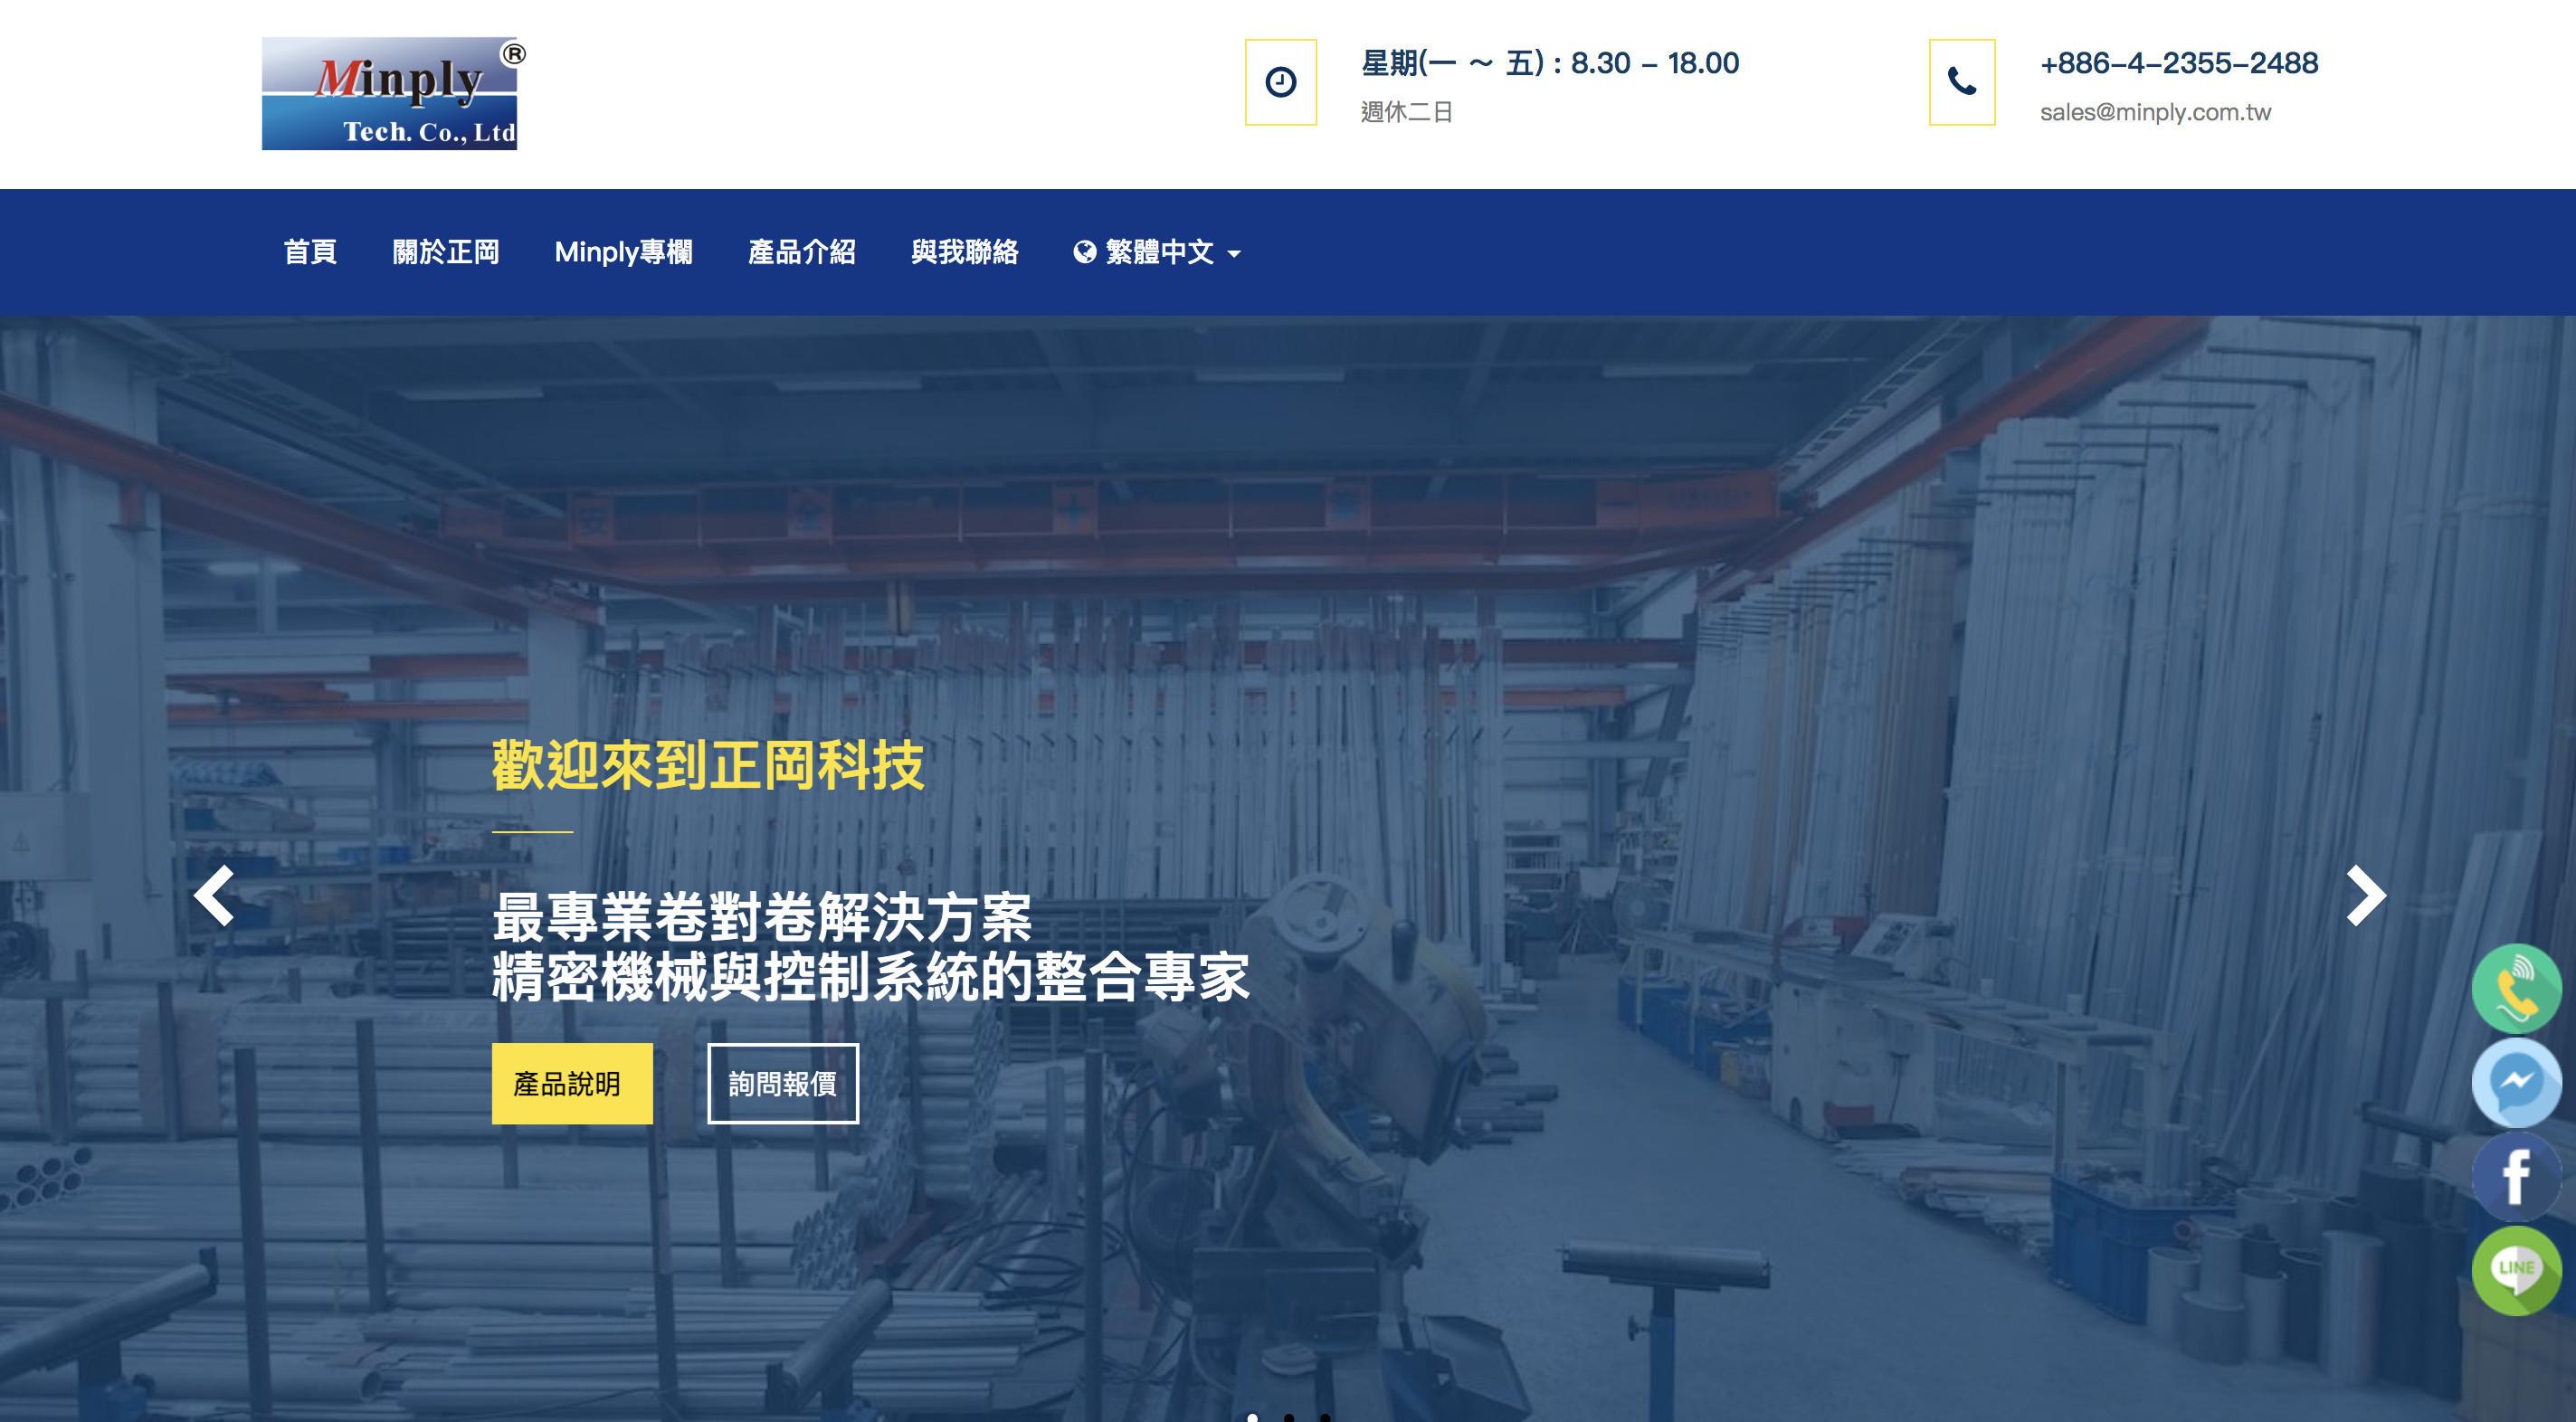 SEO網頁設計成功案例-正岡科技股份有限公司Banner